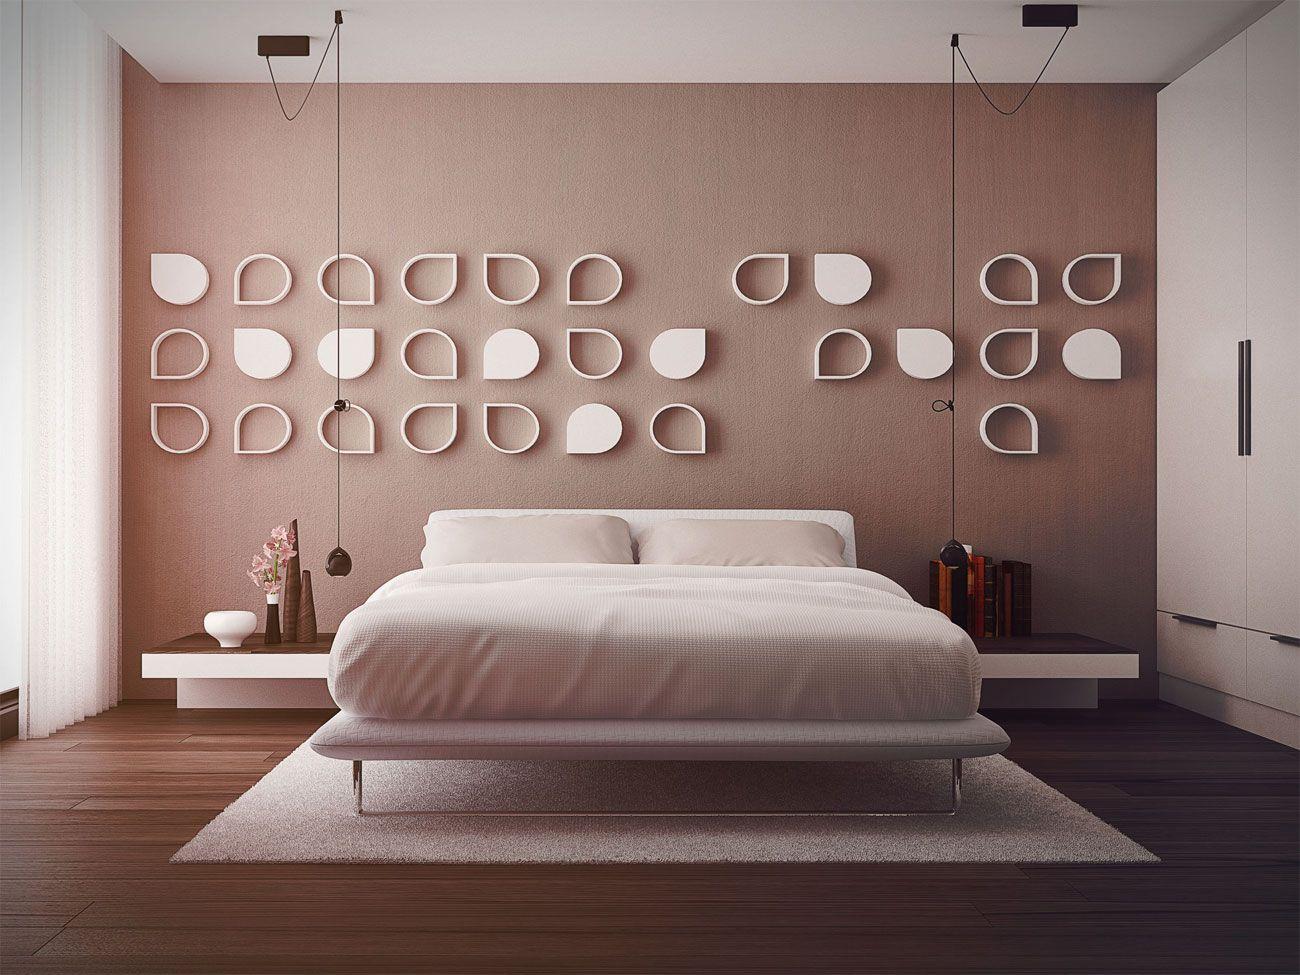 Smart And Sassy Bedrooms Bedroom Interior Bedroom Wall Designs